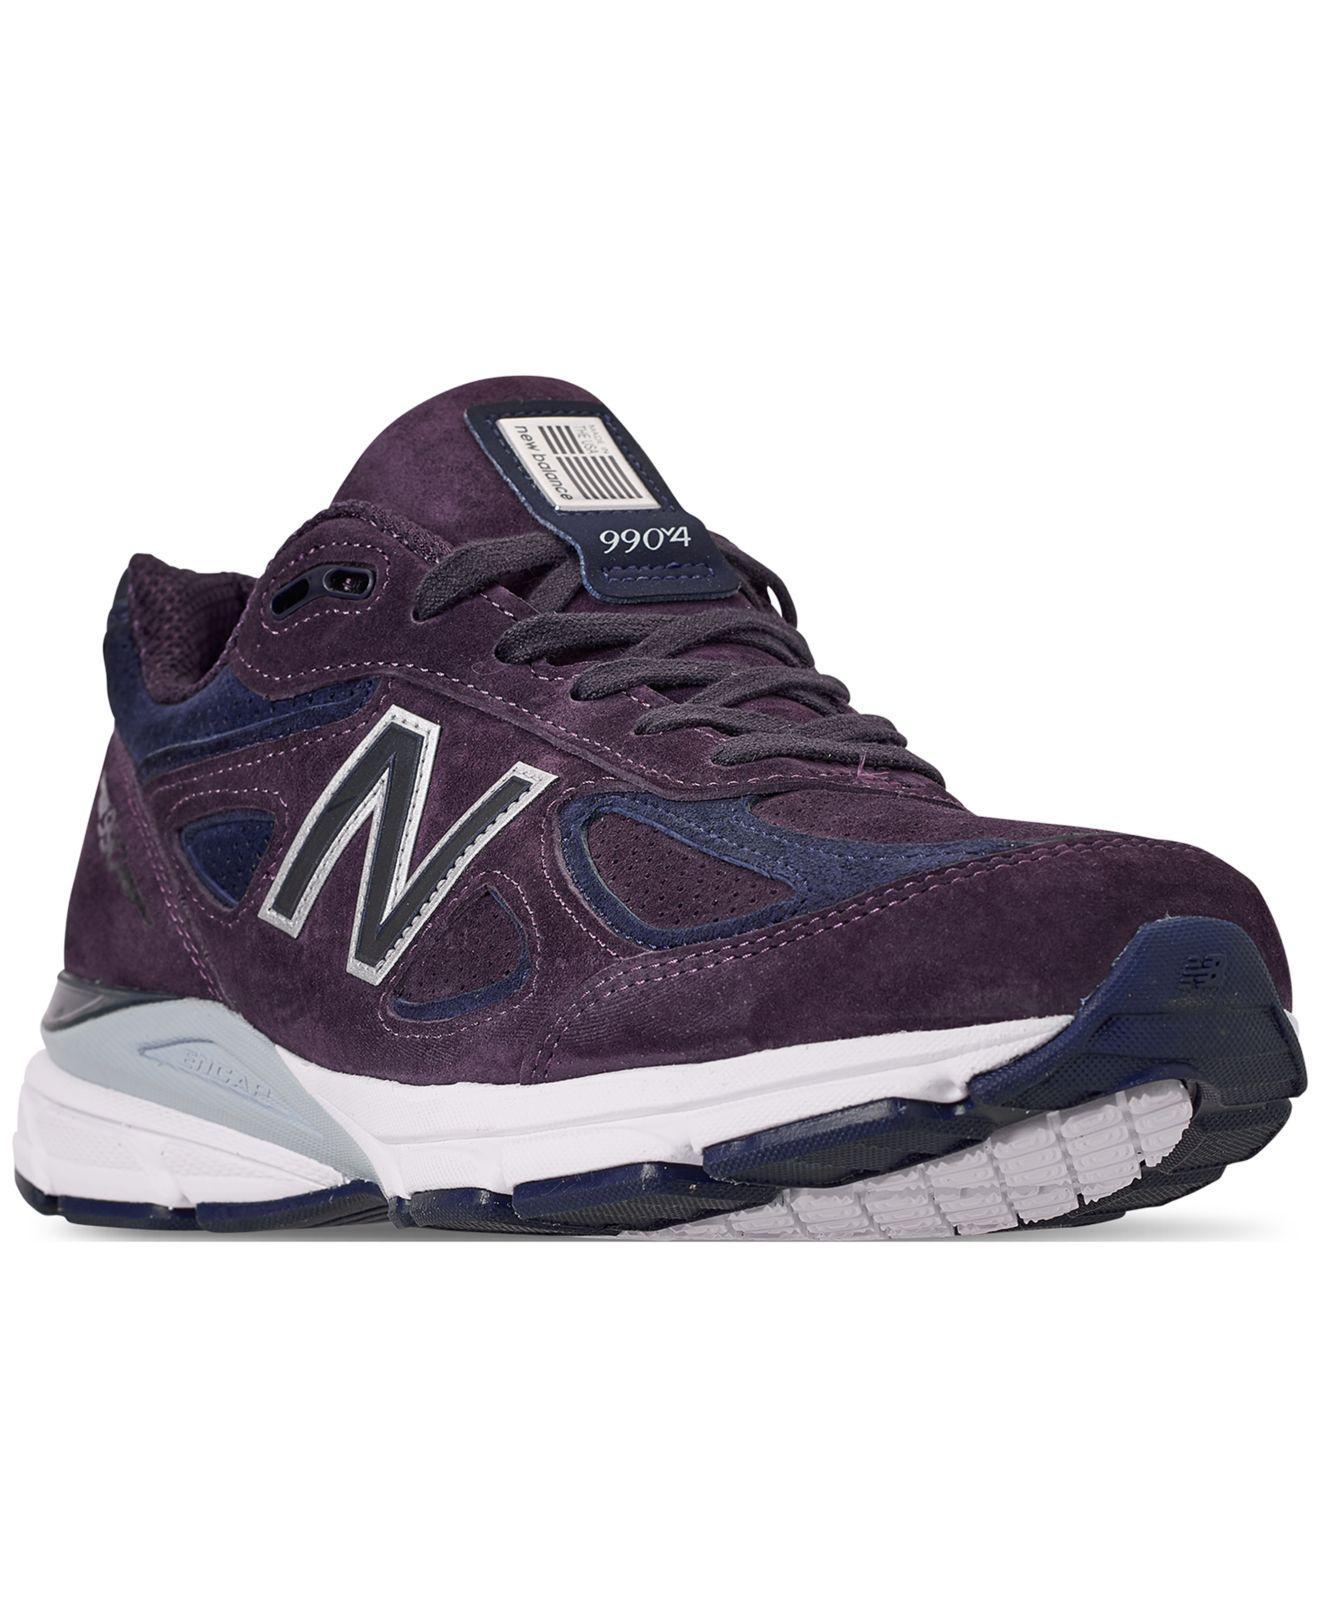 online retailer 71722 d44e5 ... Sneakers From Finish Line for Men - Lyst. View fullscreen